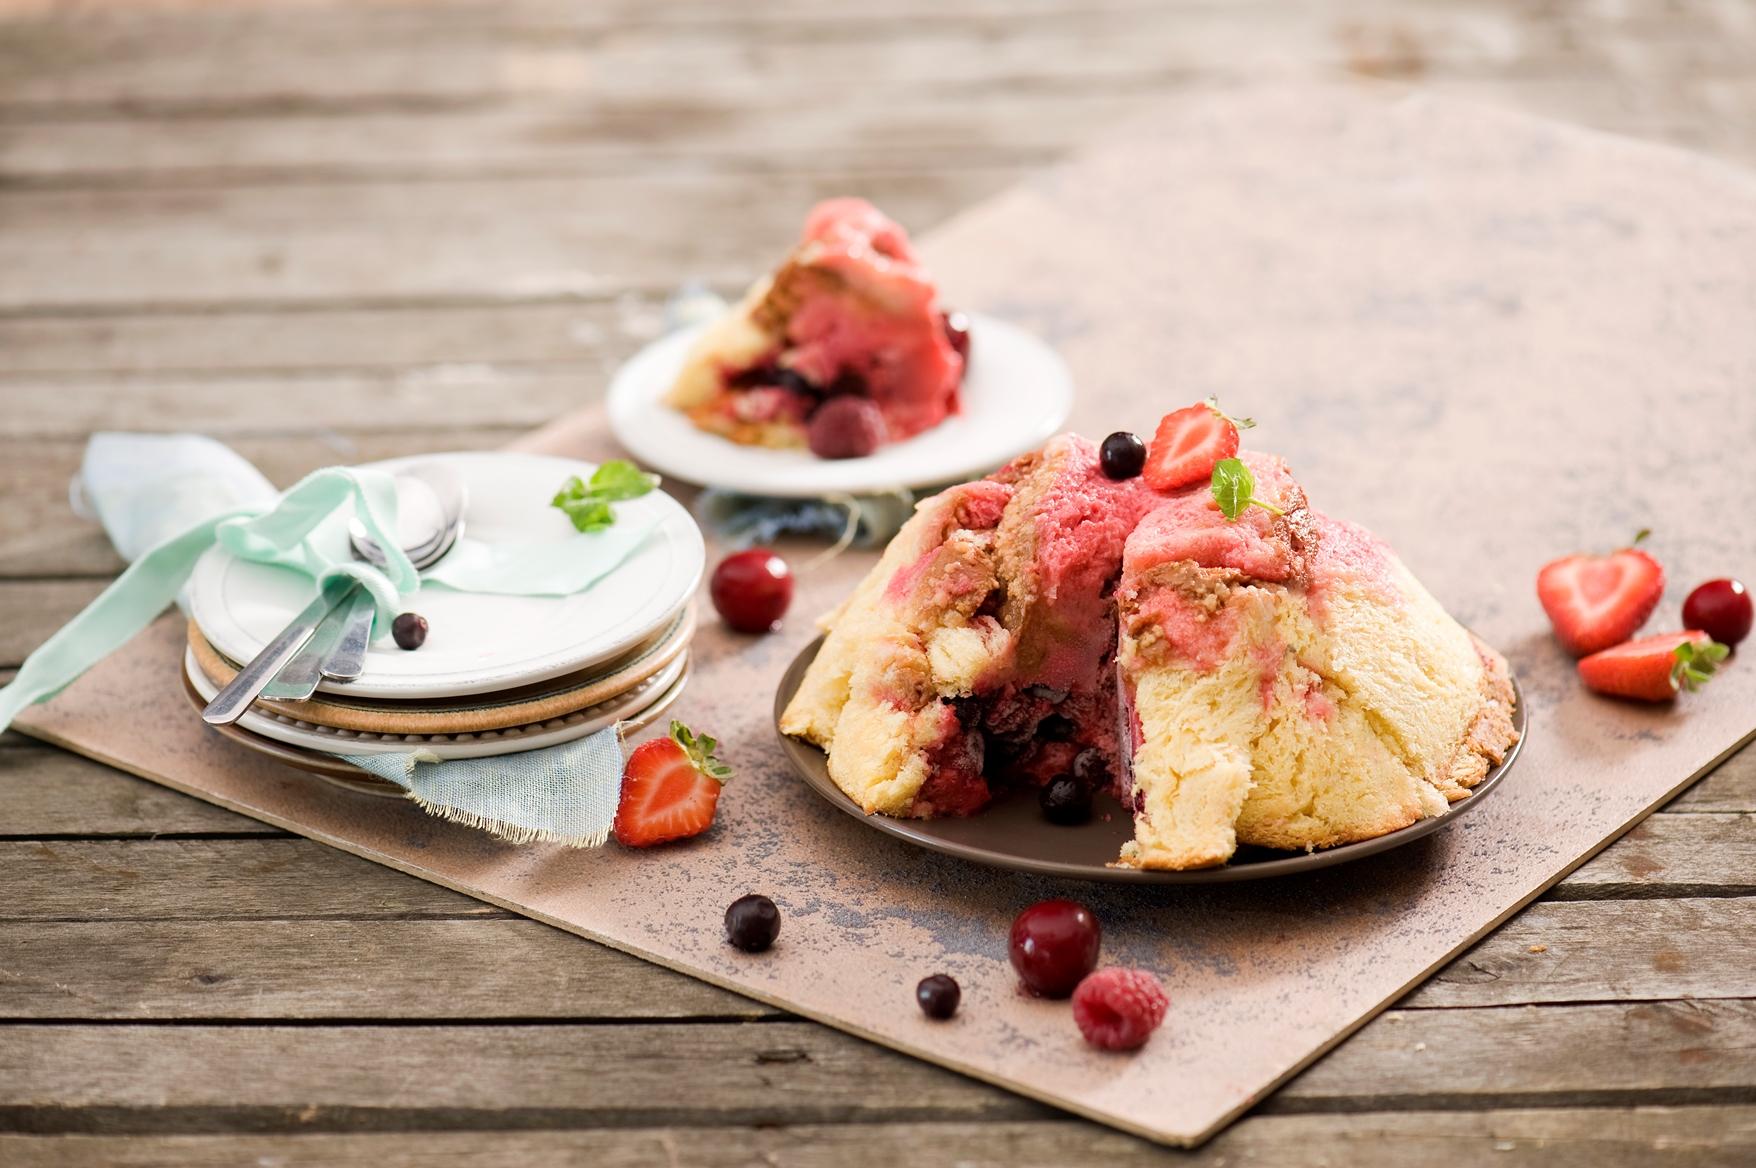 Letni pudding z owocami